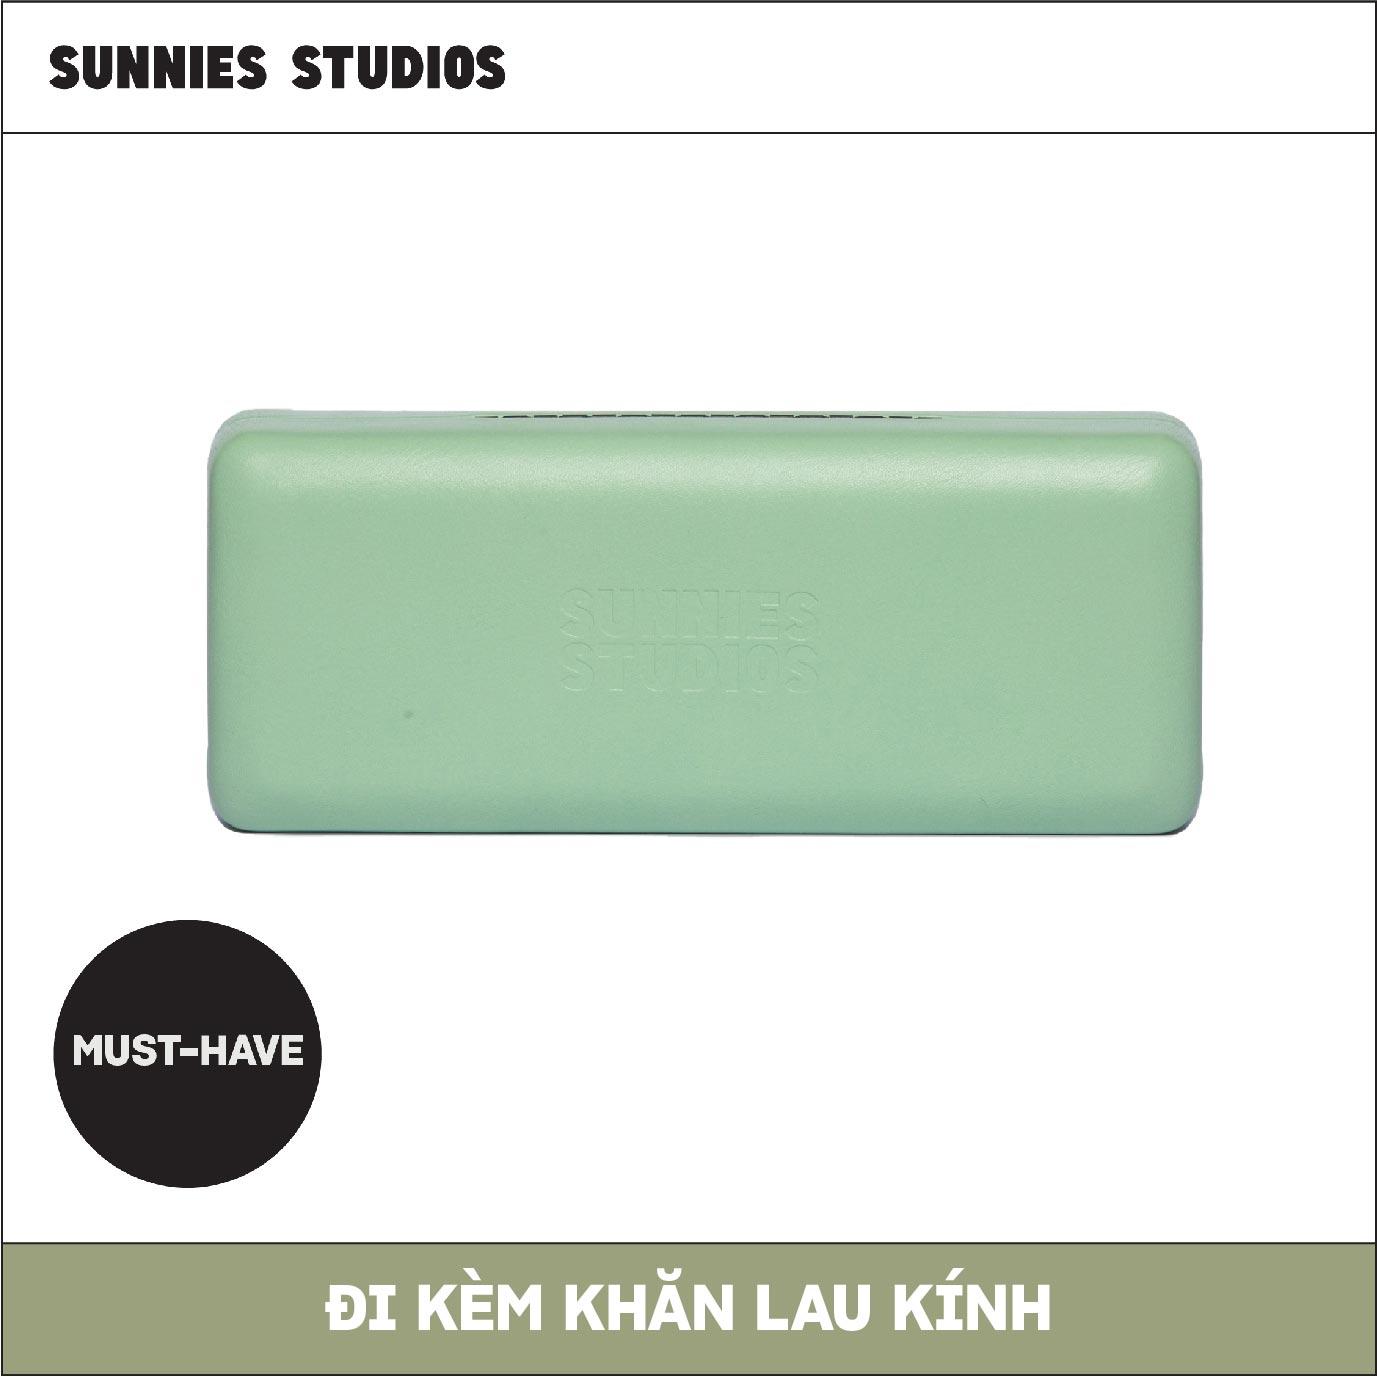 Mua Hộp Kính Xanh Sea Foam Sunnies Studios